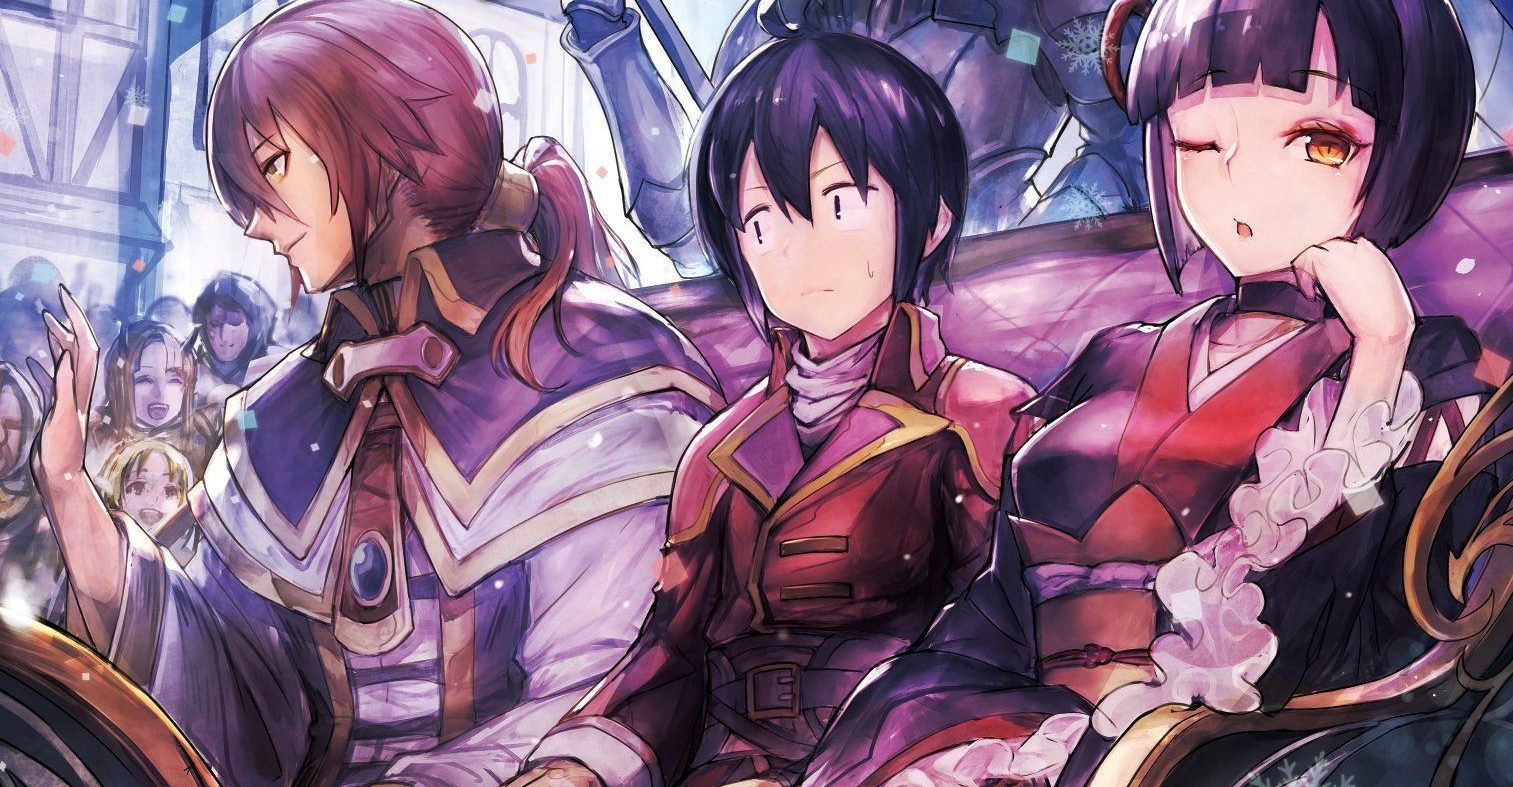 TSUKIMICHI Moonlit Fantasy: Anime startet nächstes Jahr